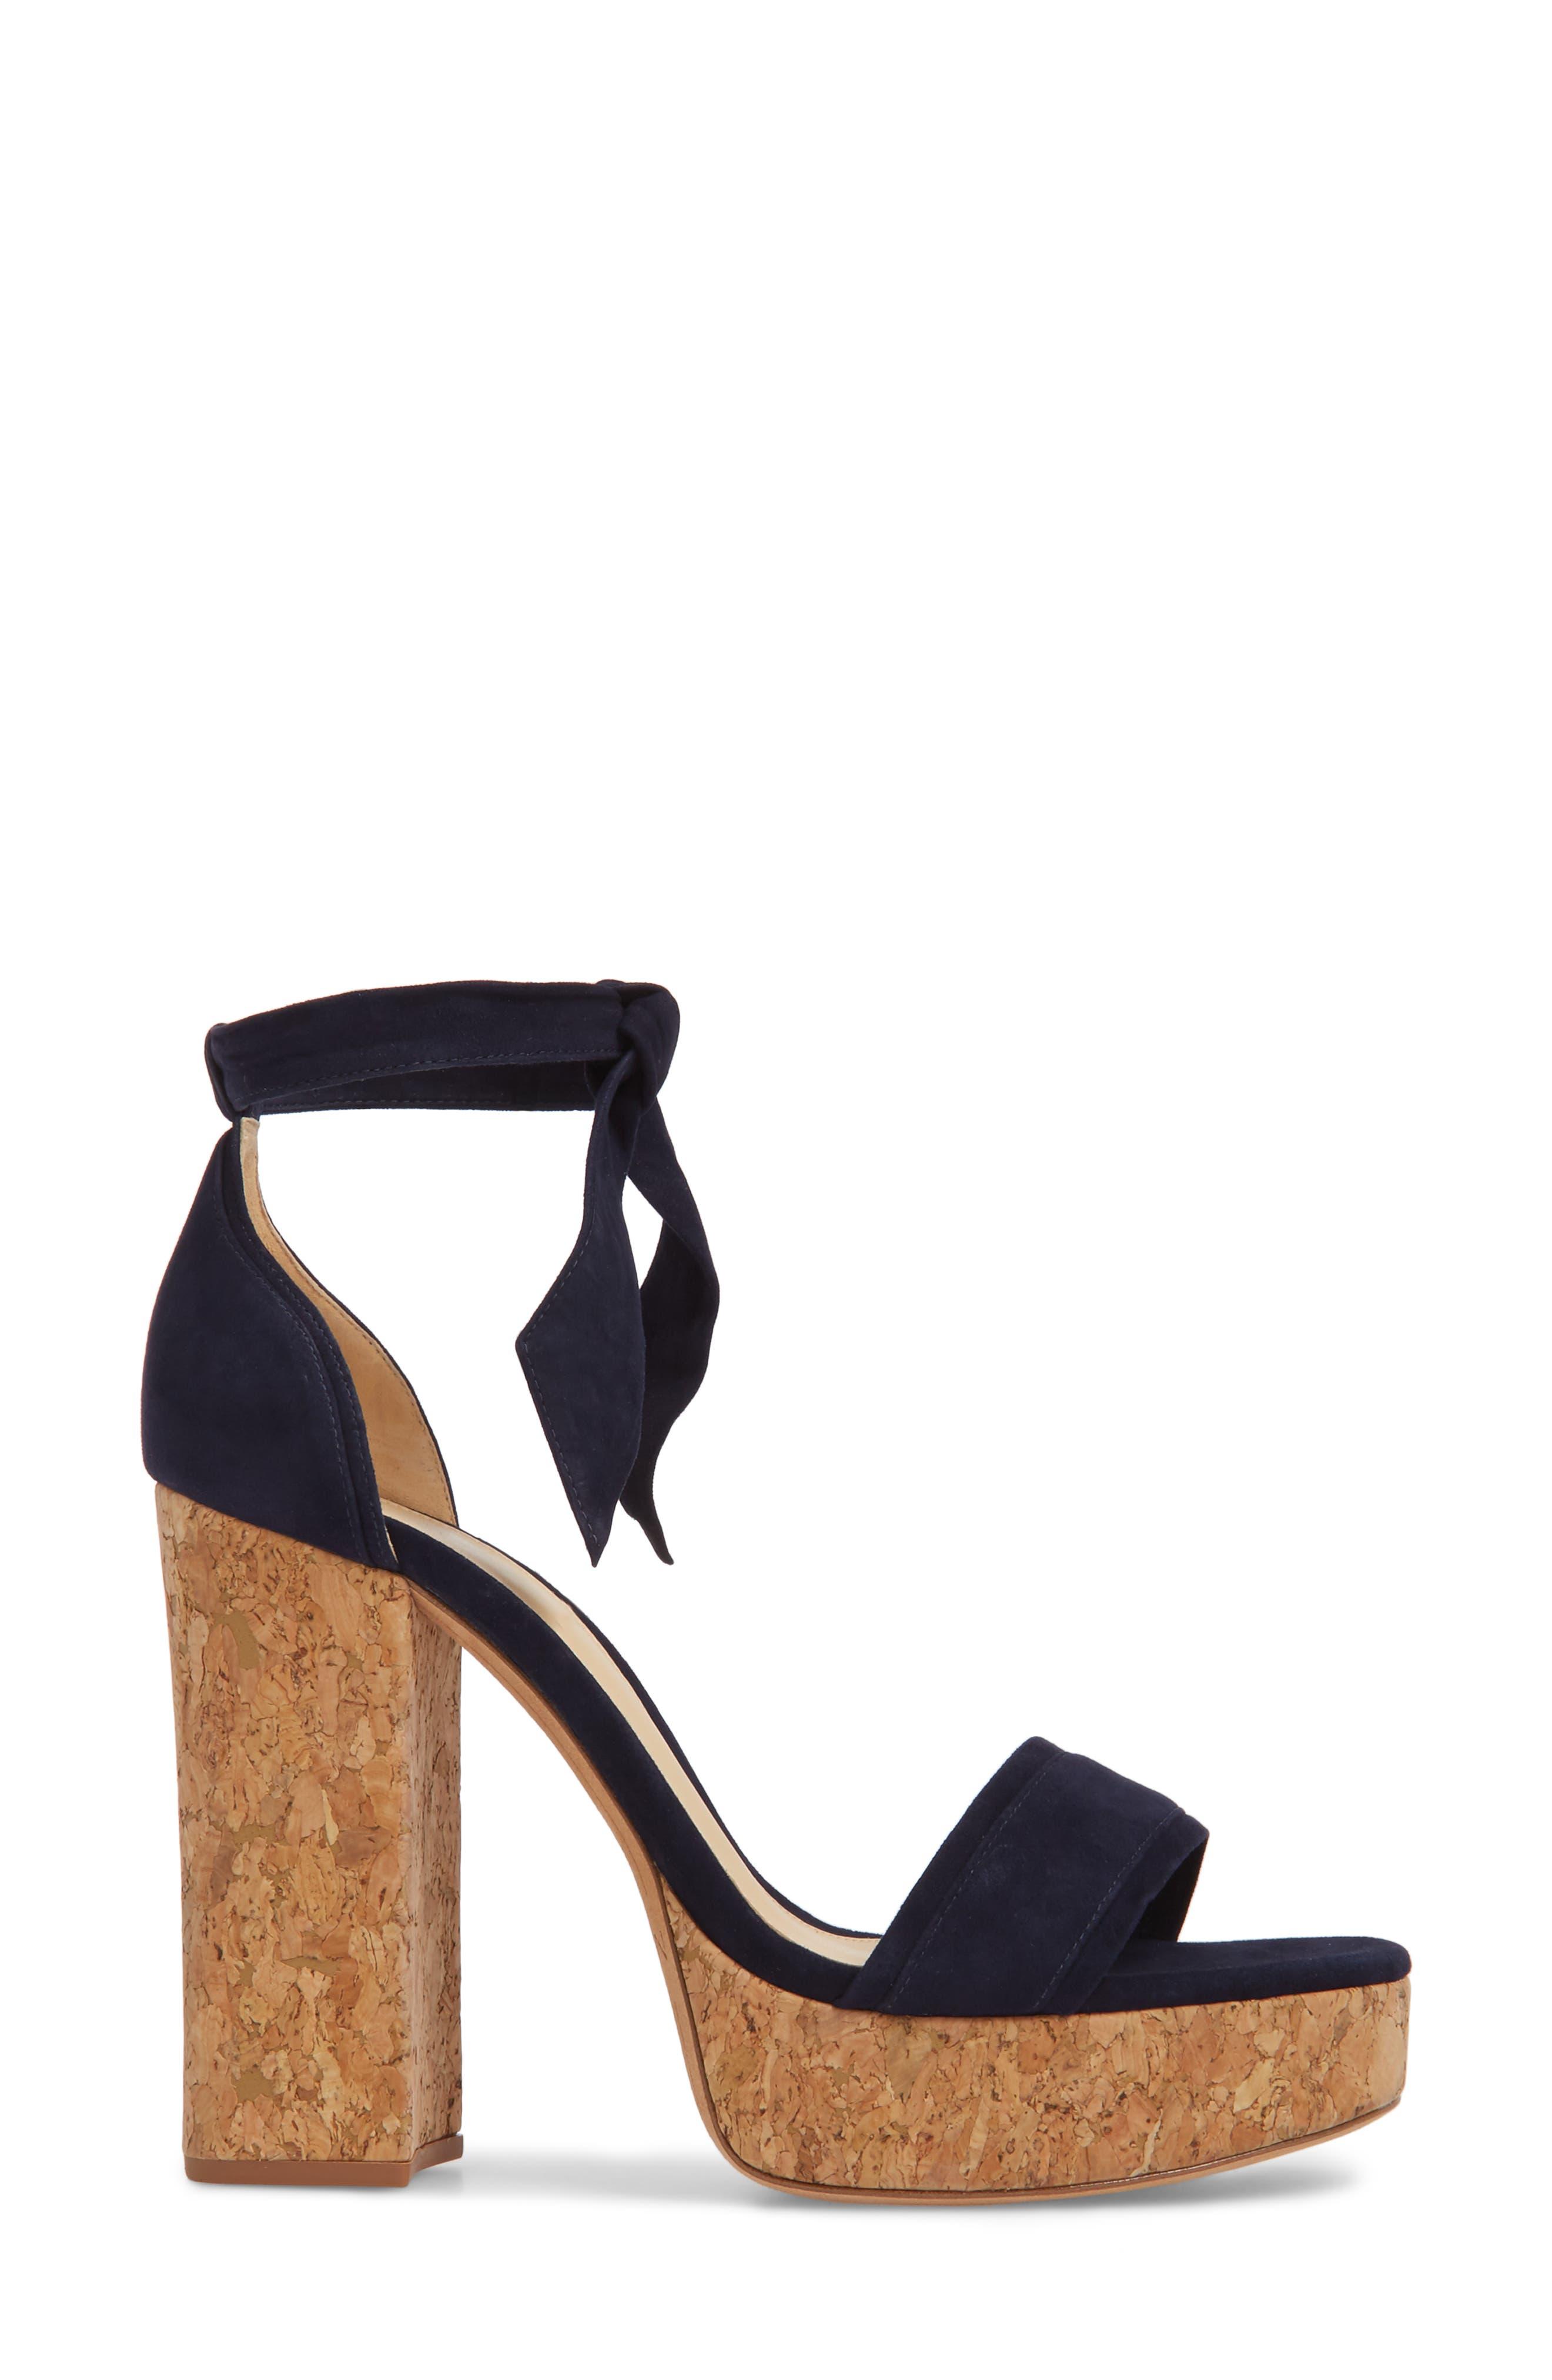 Celine Ankle Tie Platform Sandal,                             Alternate thumbnail 3, color,                             400